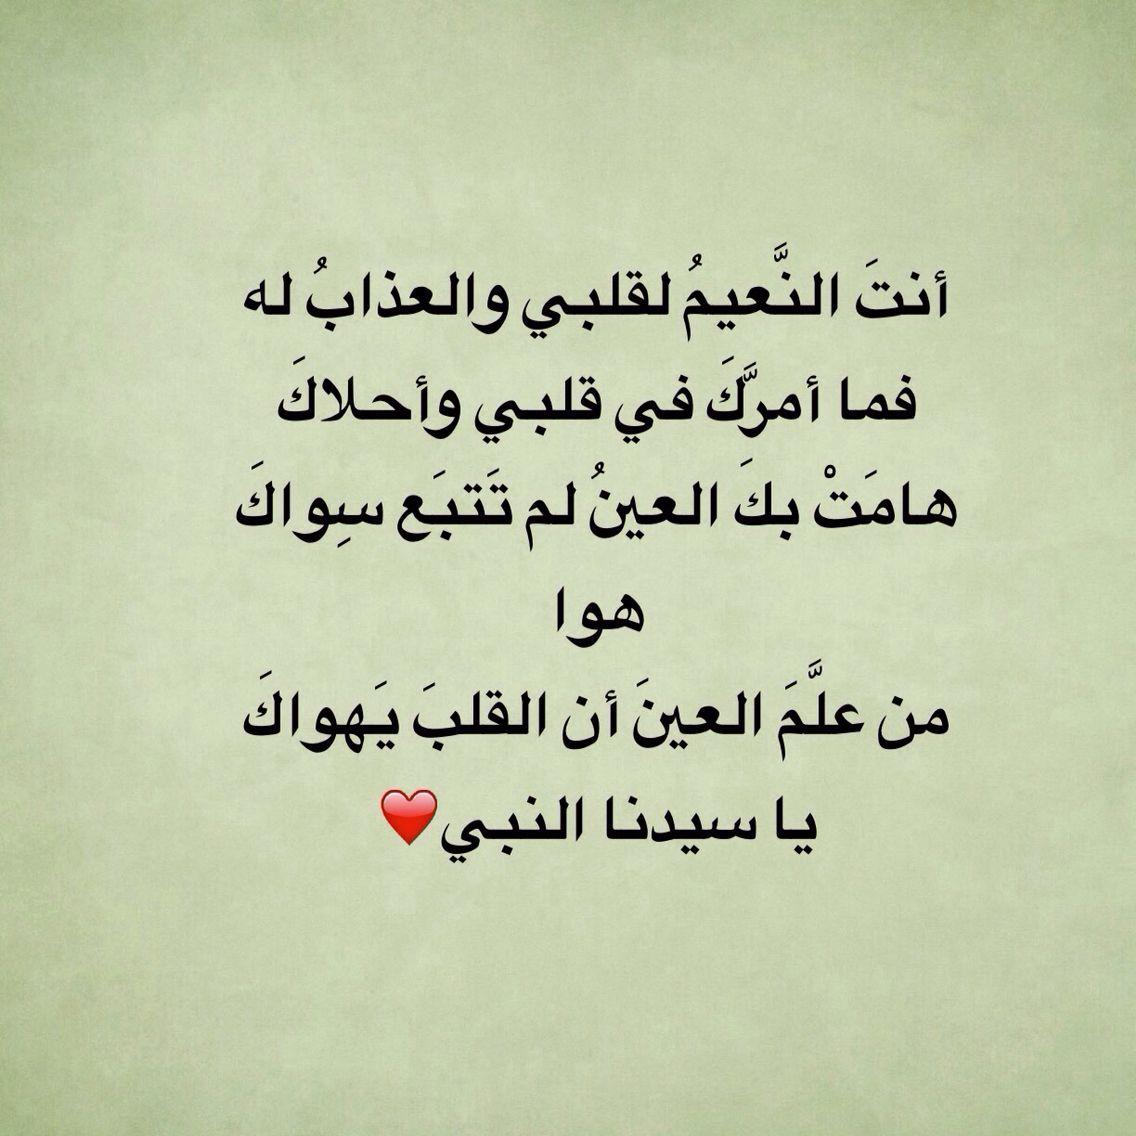 فى حب رسول الله Poems Arabic Calligraphy Calligraphy